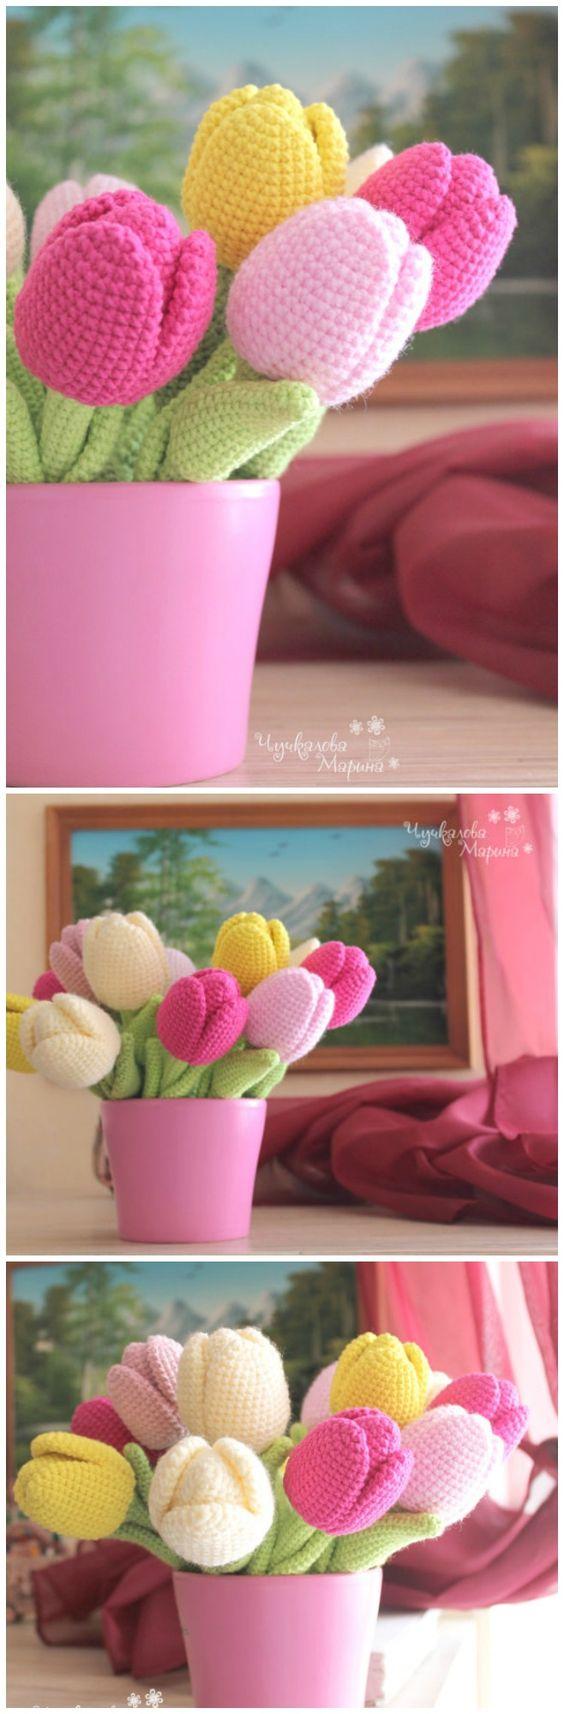 ramo flores crochet-decoracion-otakulandia.es (38)